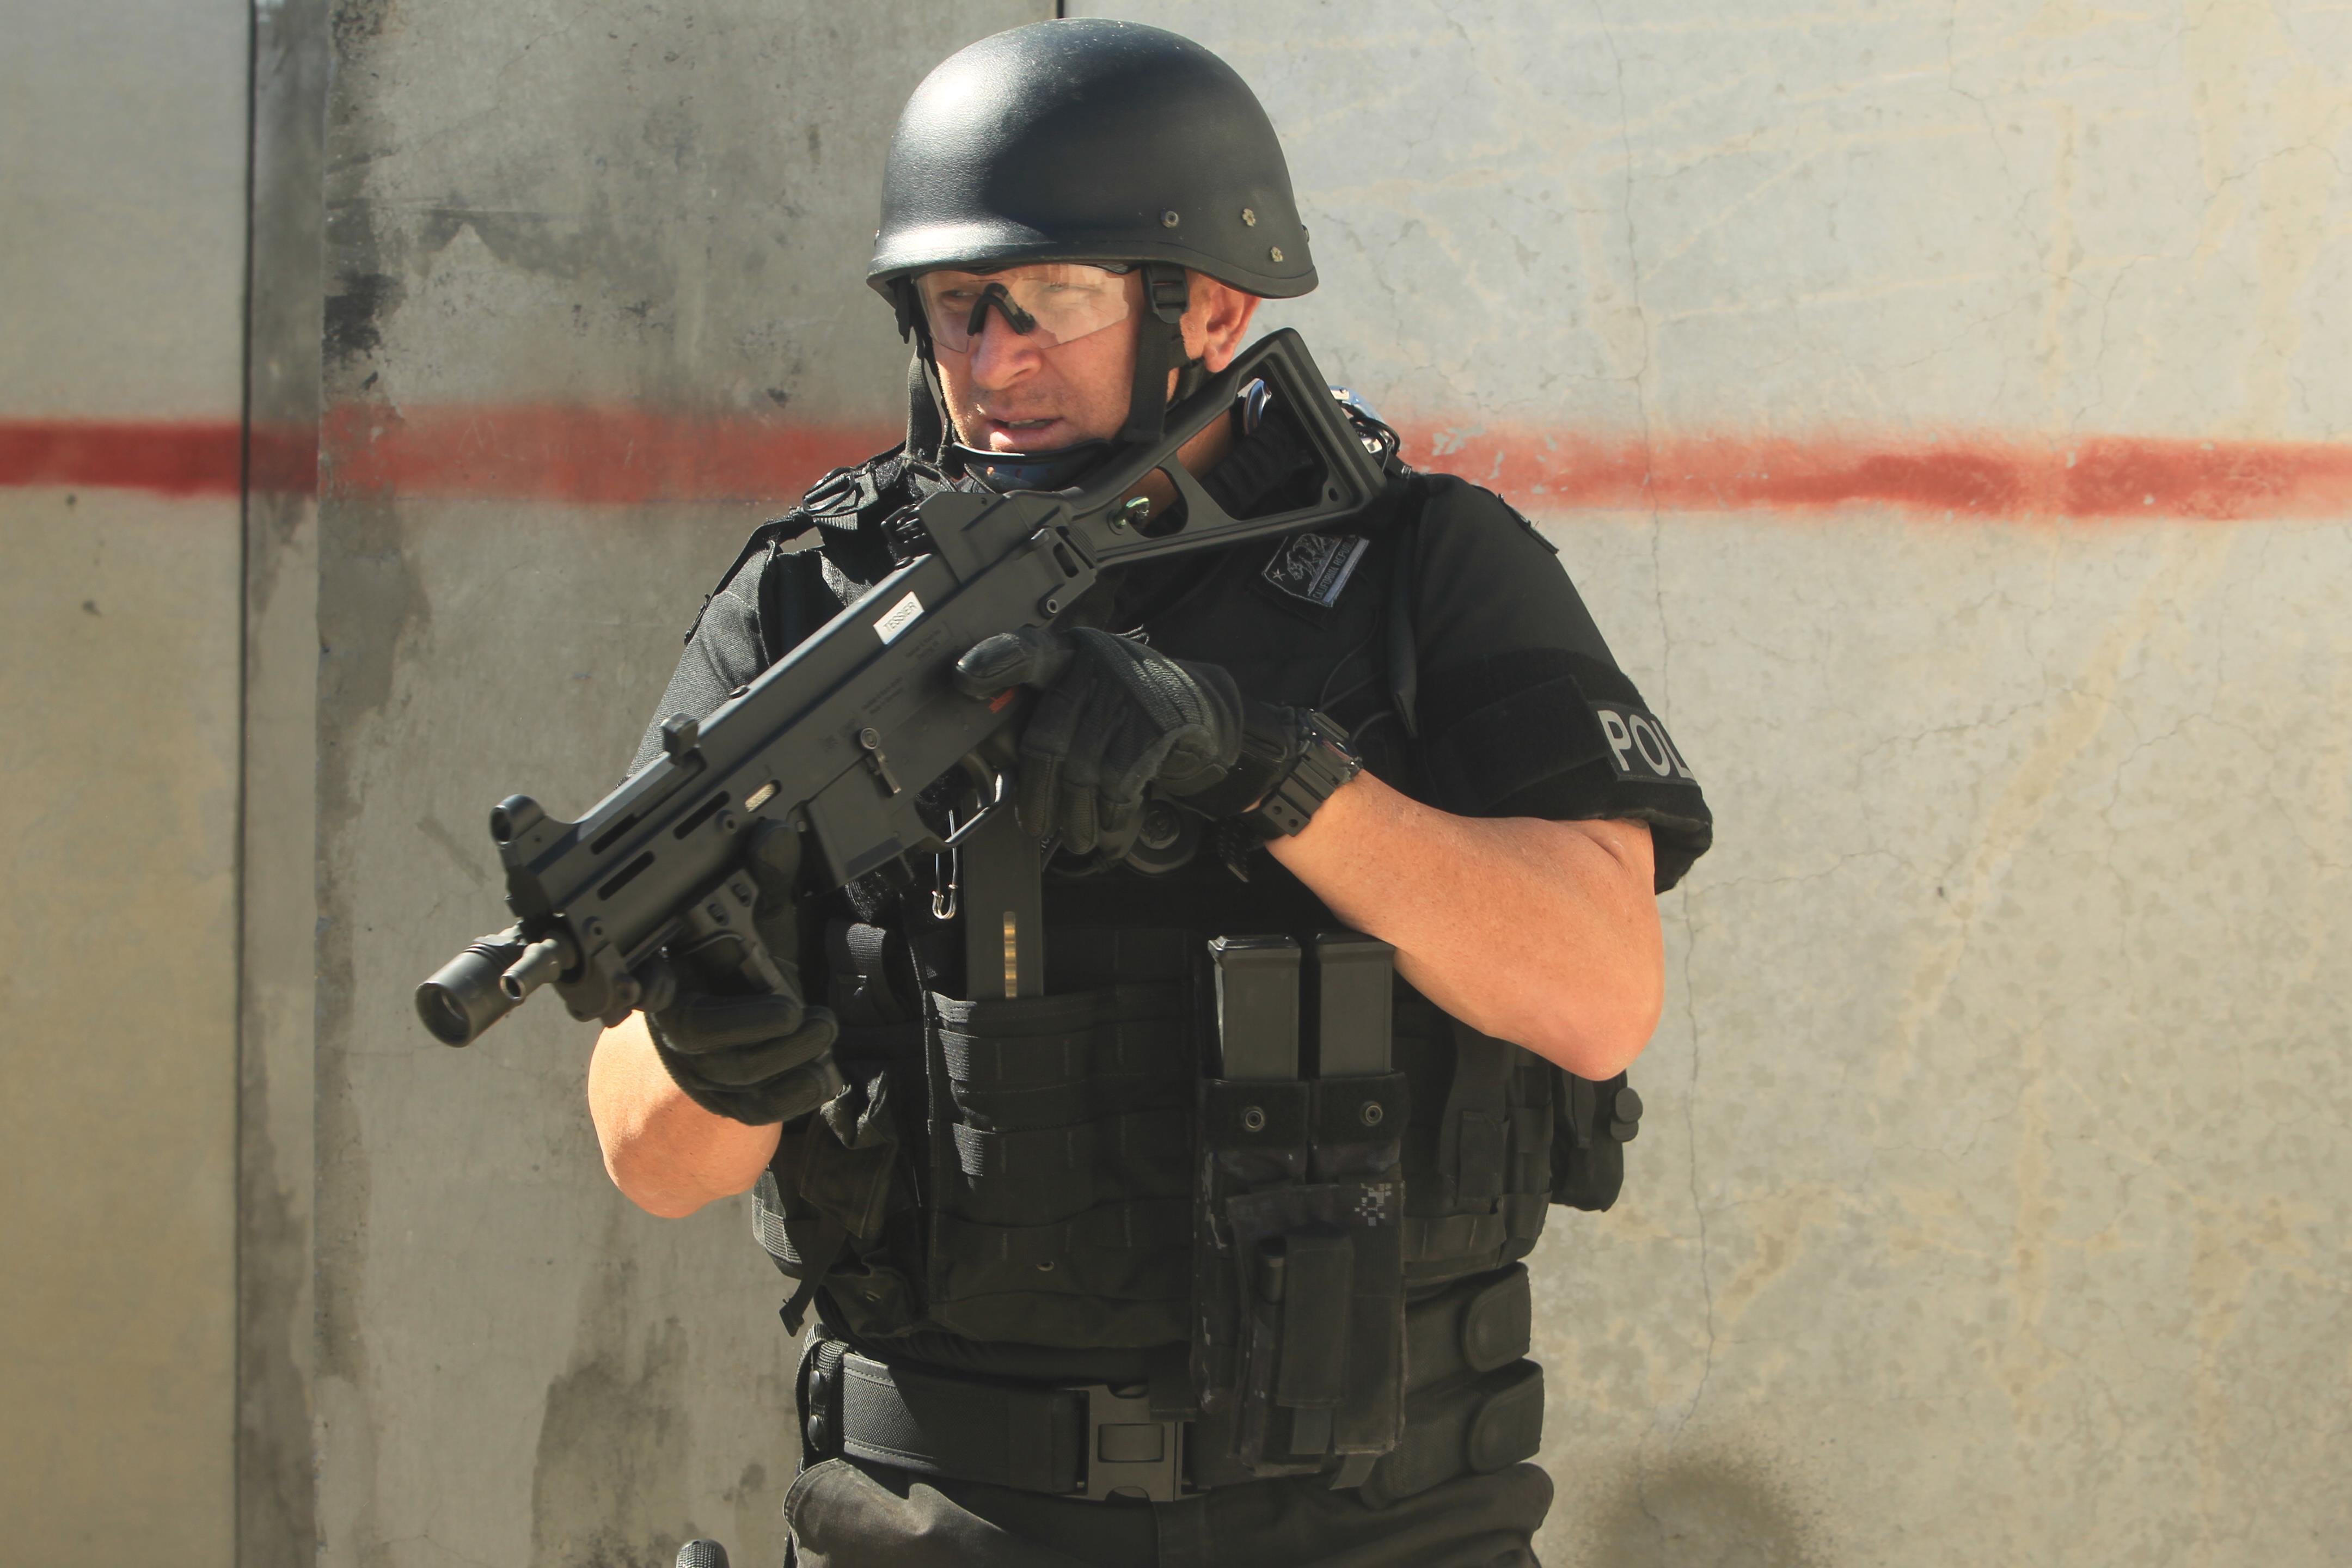 military civilian police train to her aboard bat center